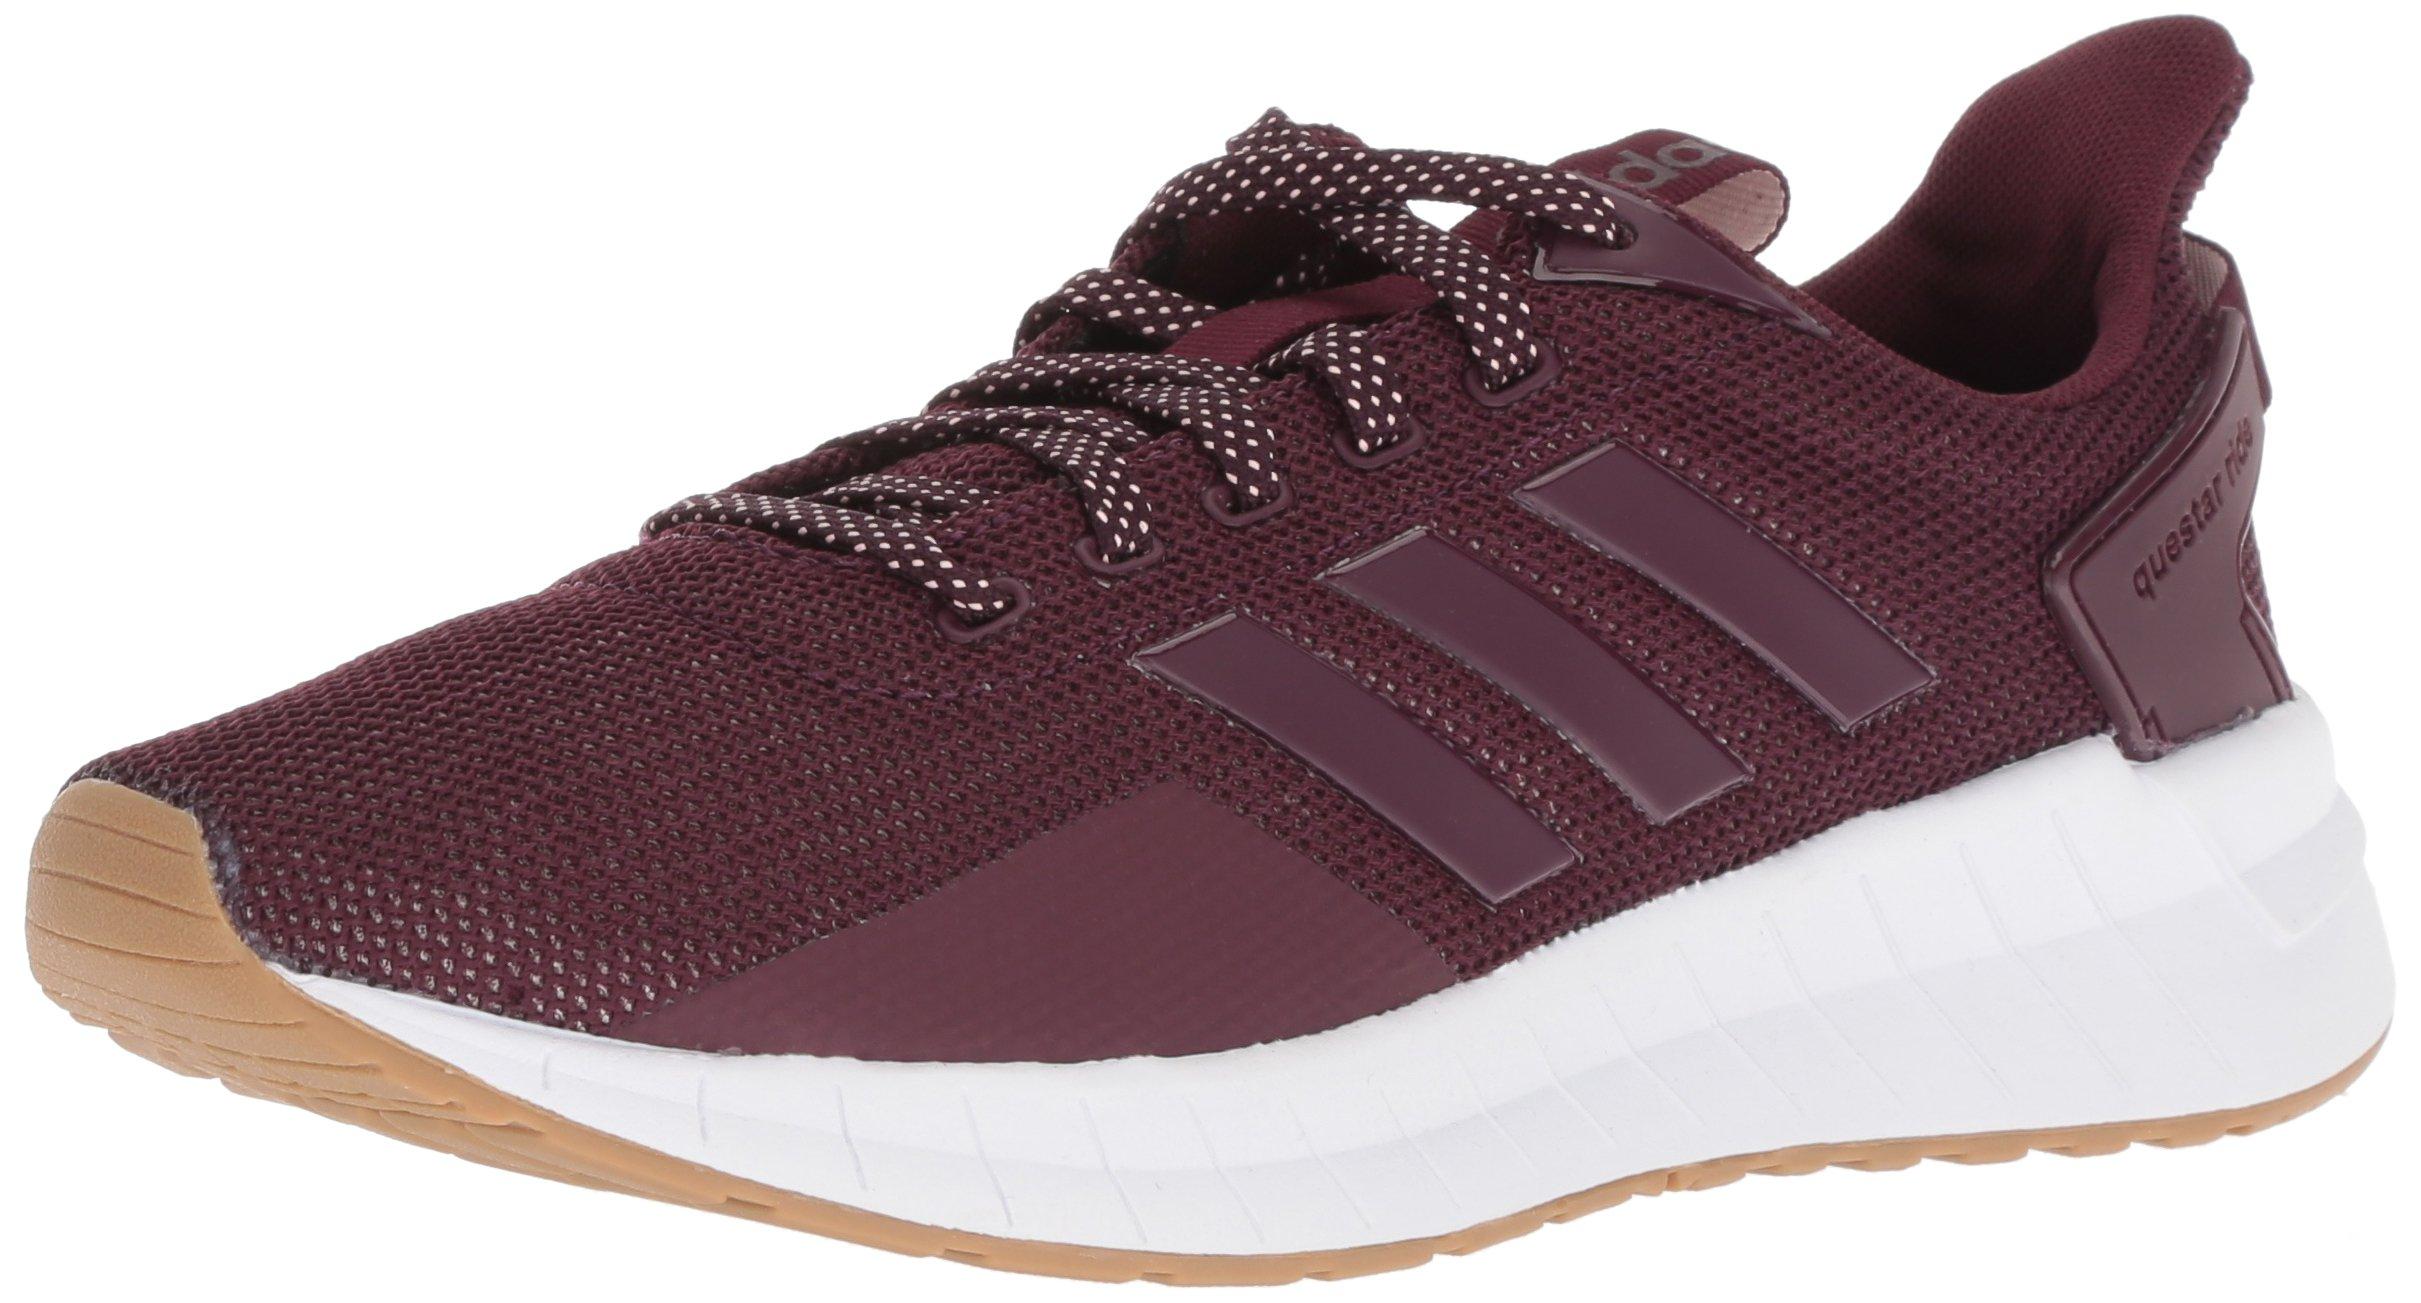 adidas Women's Questar Ride Running Shoe, Maroon/Maroon/Gum, 7.5 M US